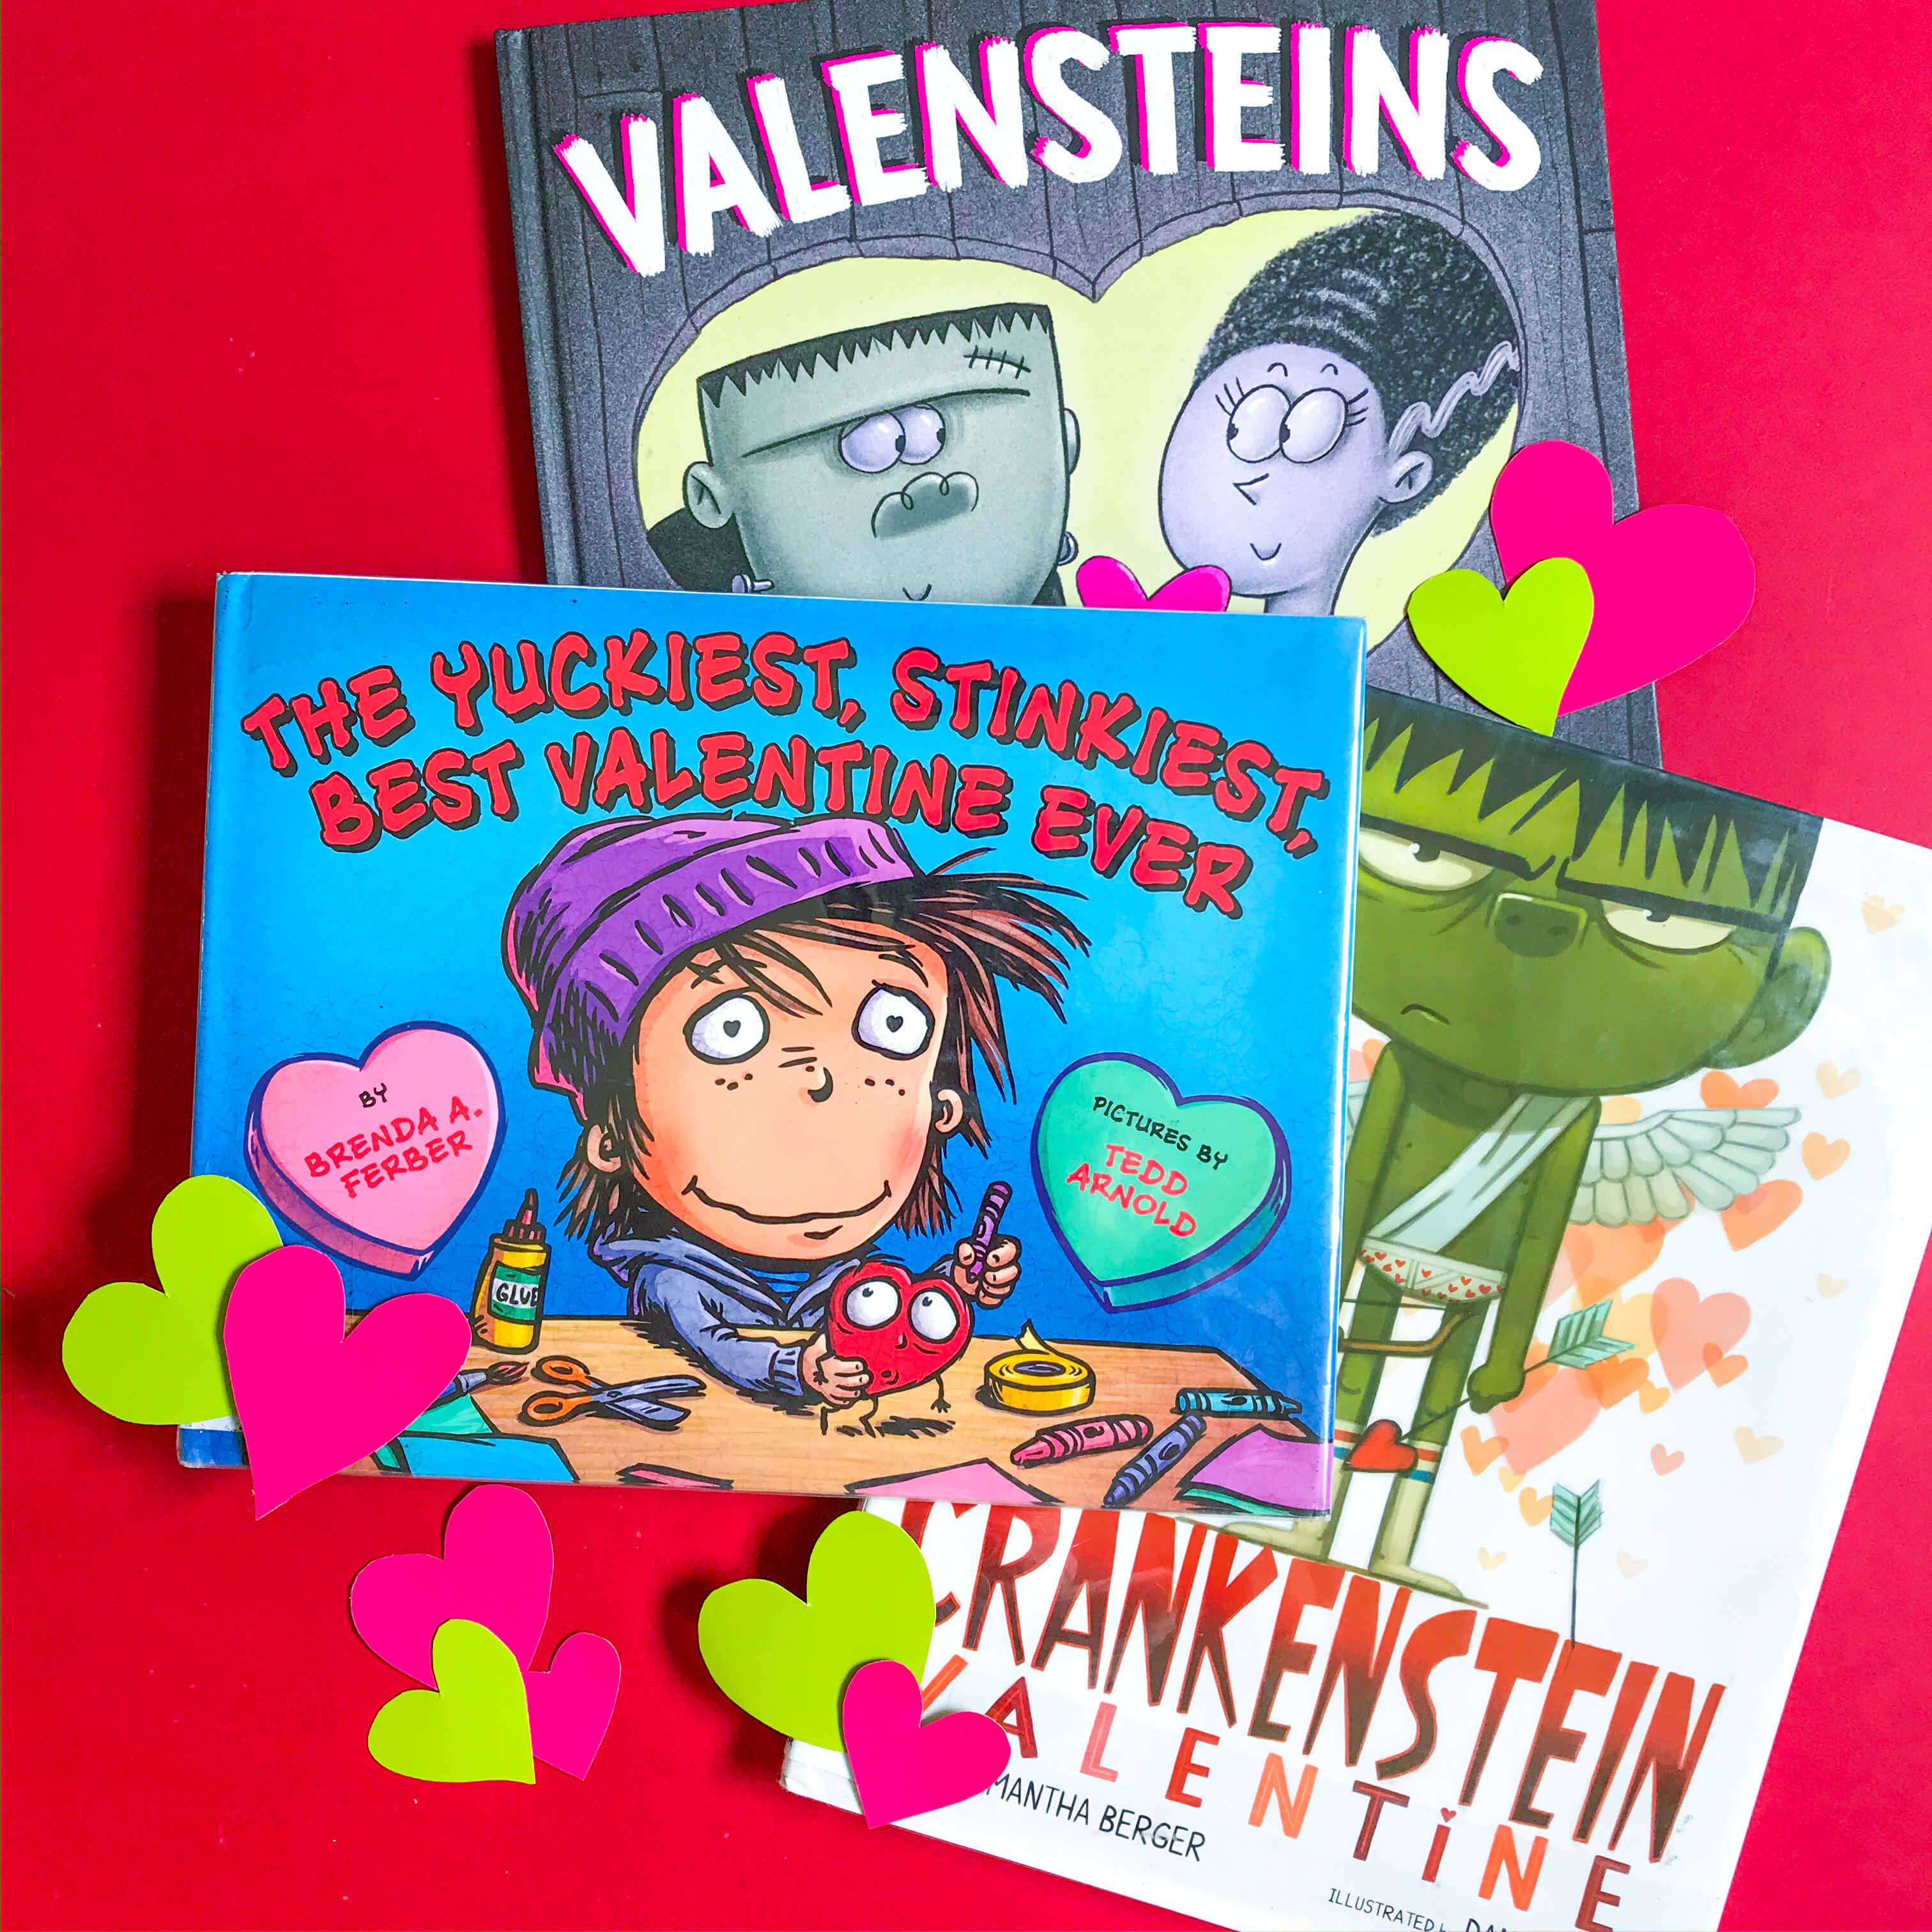 Top 3 Children's Books about Valentine's Day